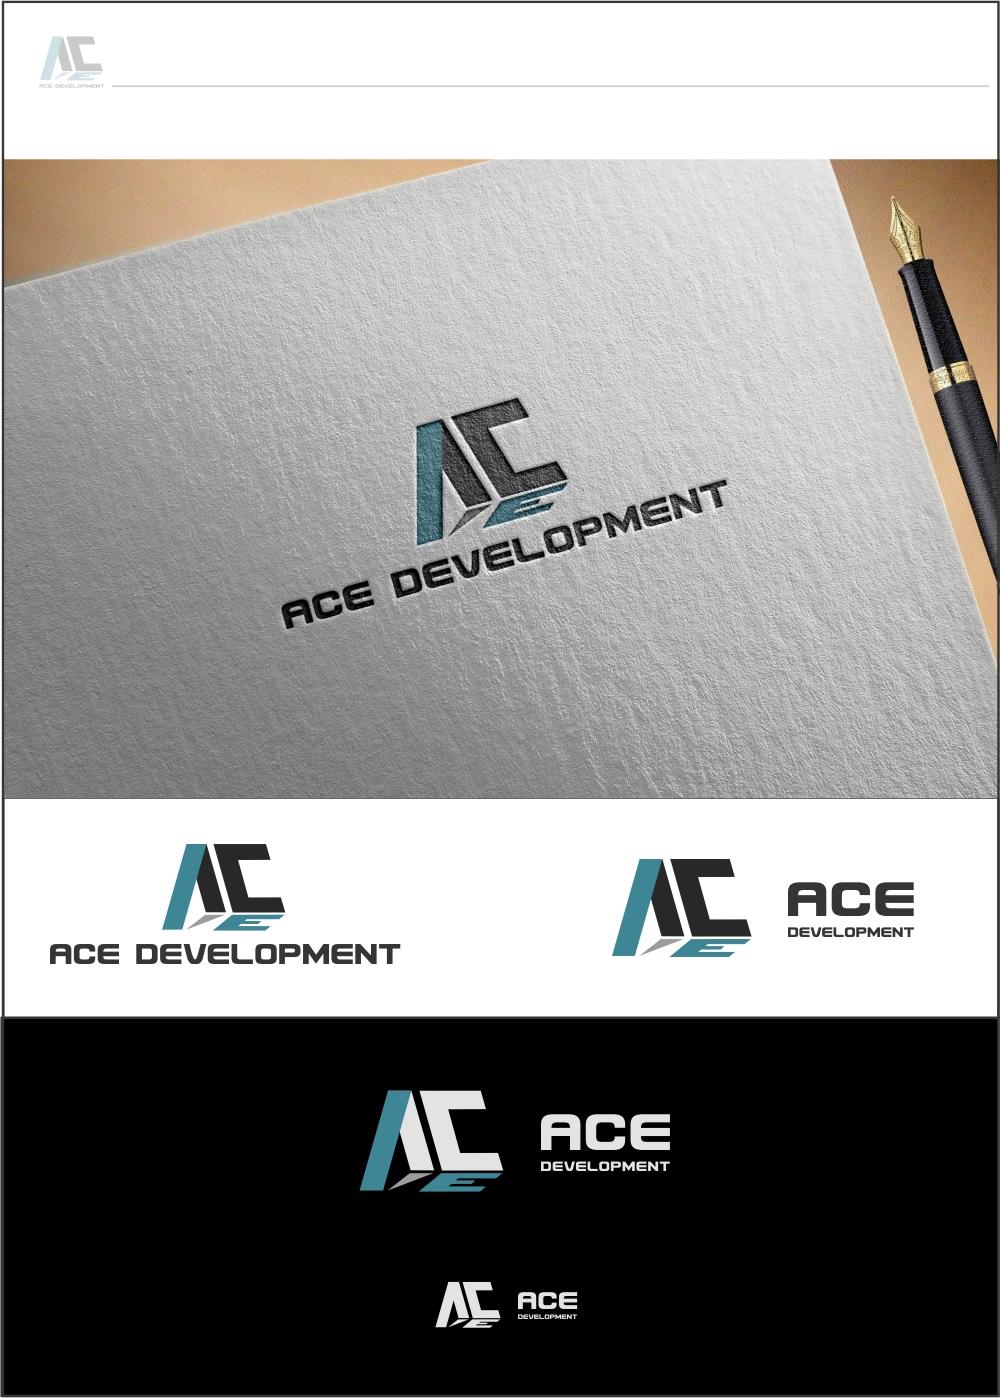 Logo Design by ian69 - Entry No. 10 in the Logo Design Contest Fun Logo Design for Ace development.